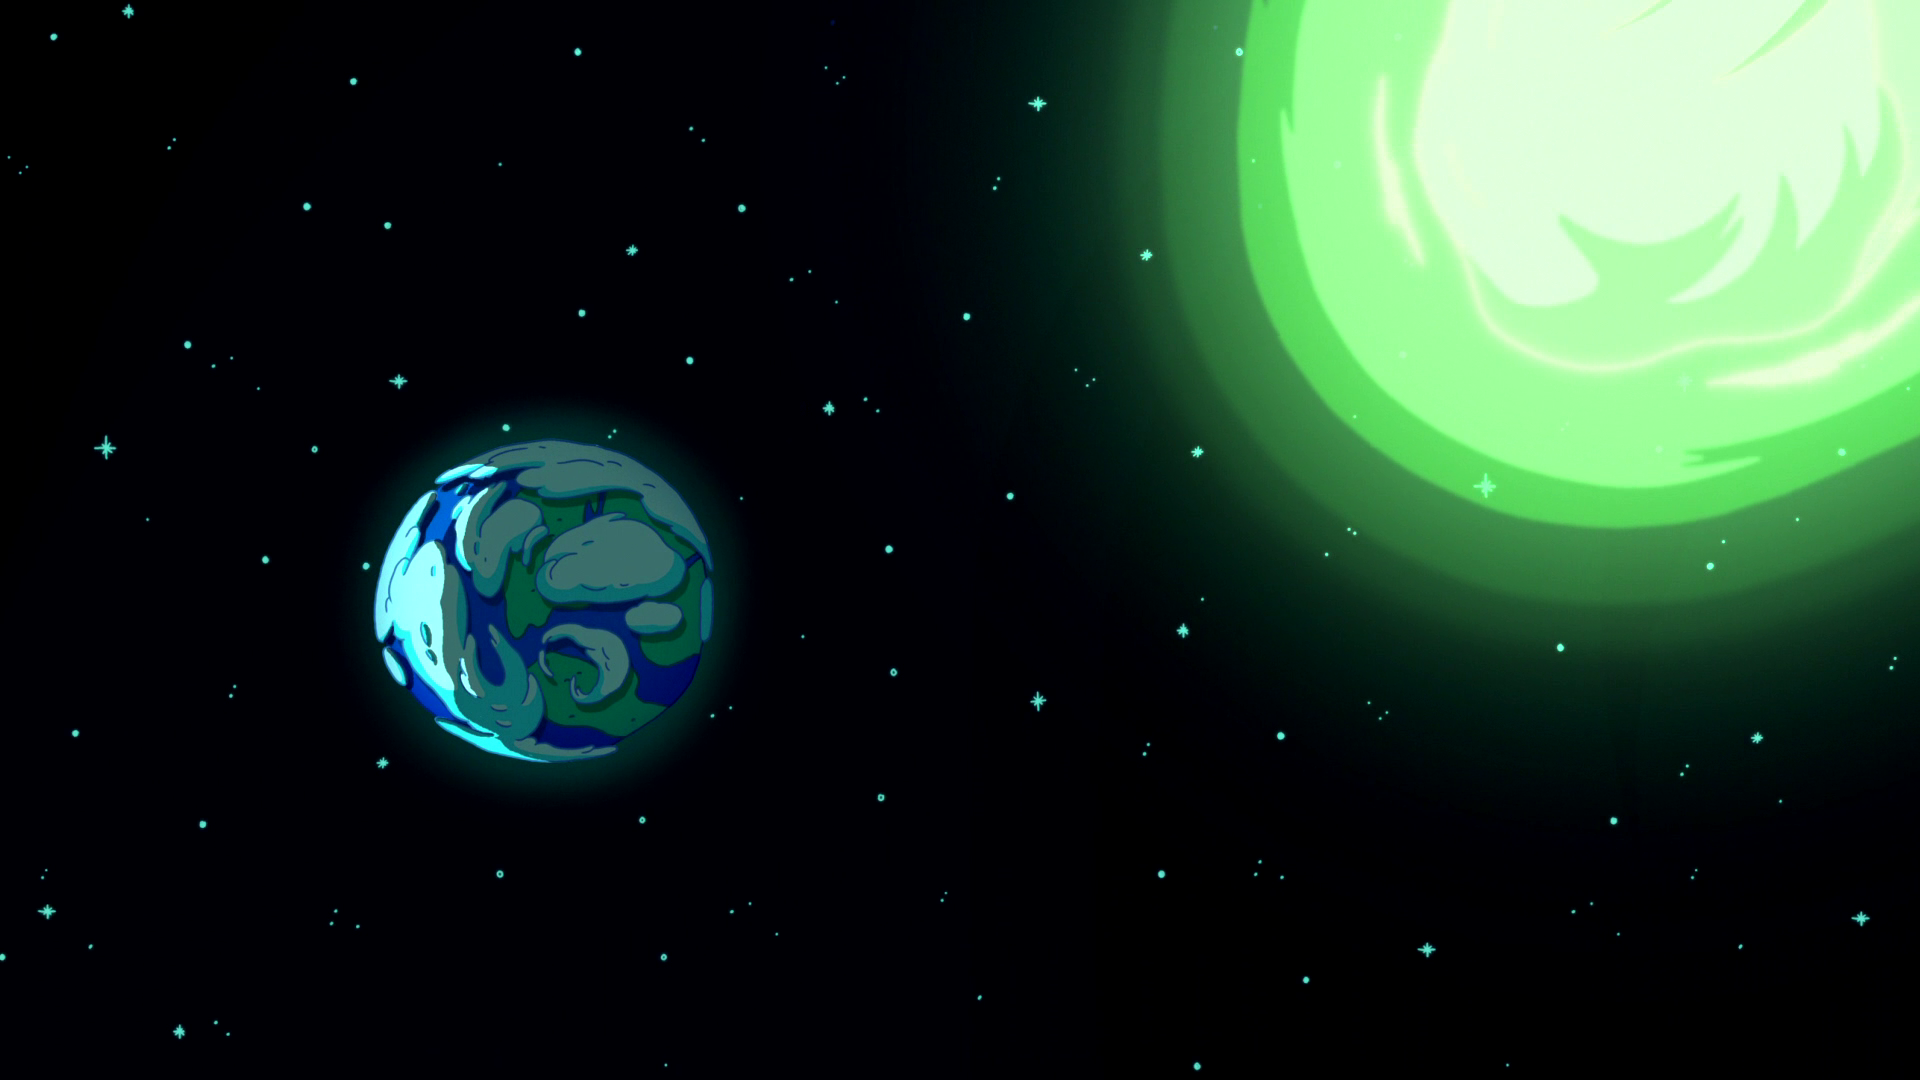 S6e24 Comet approaching Earth